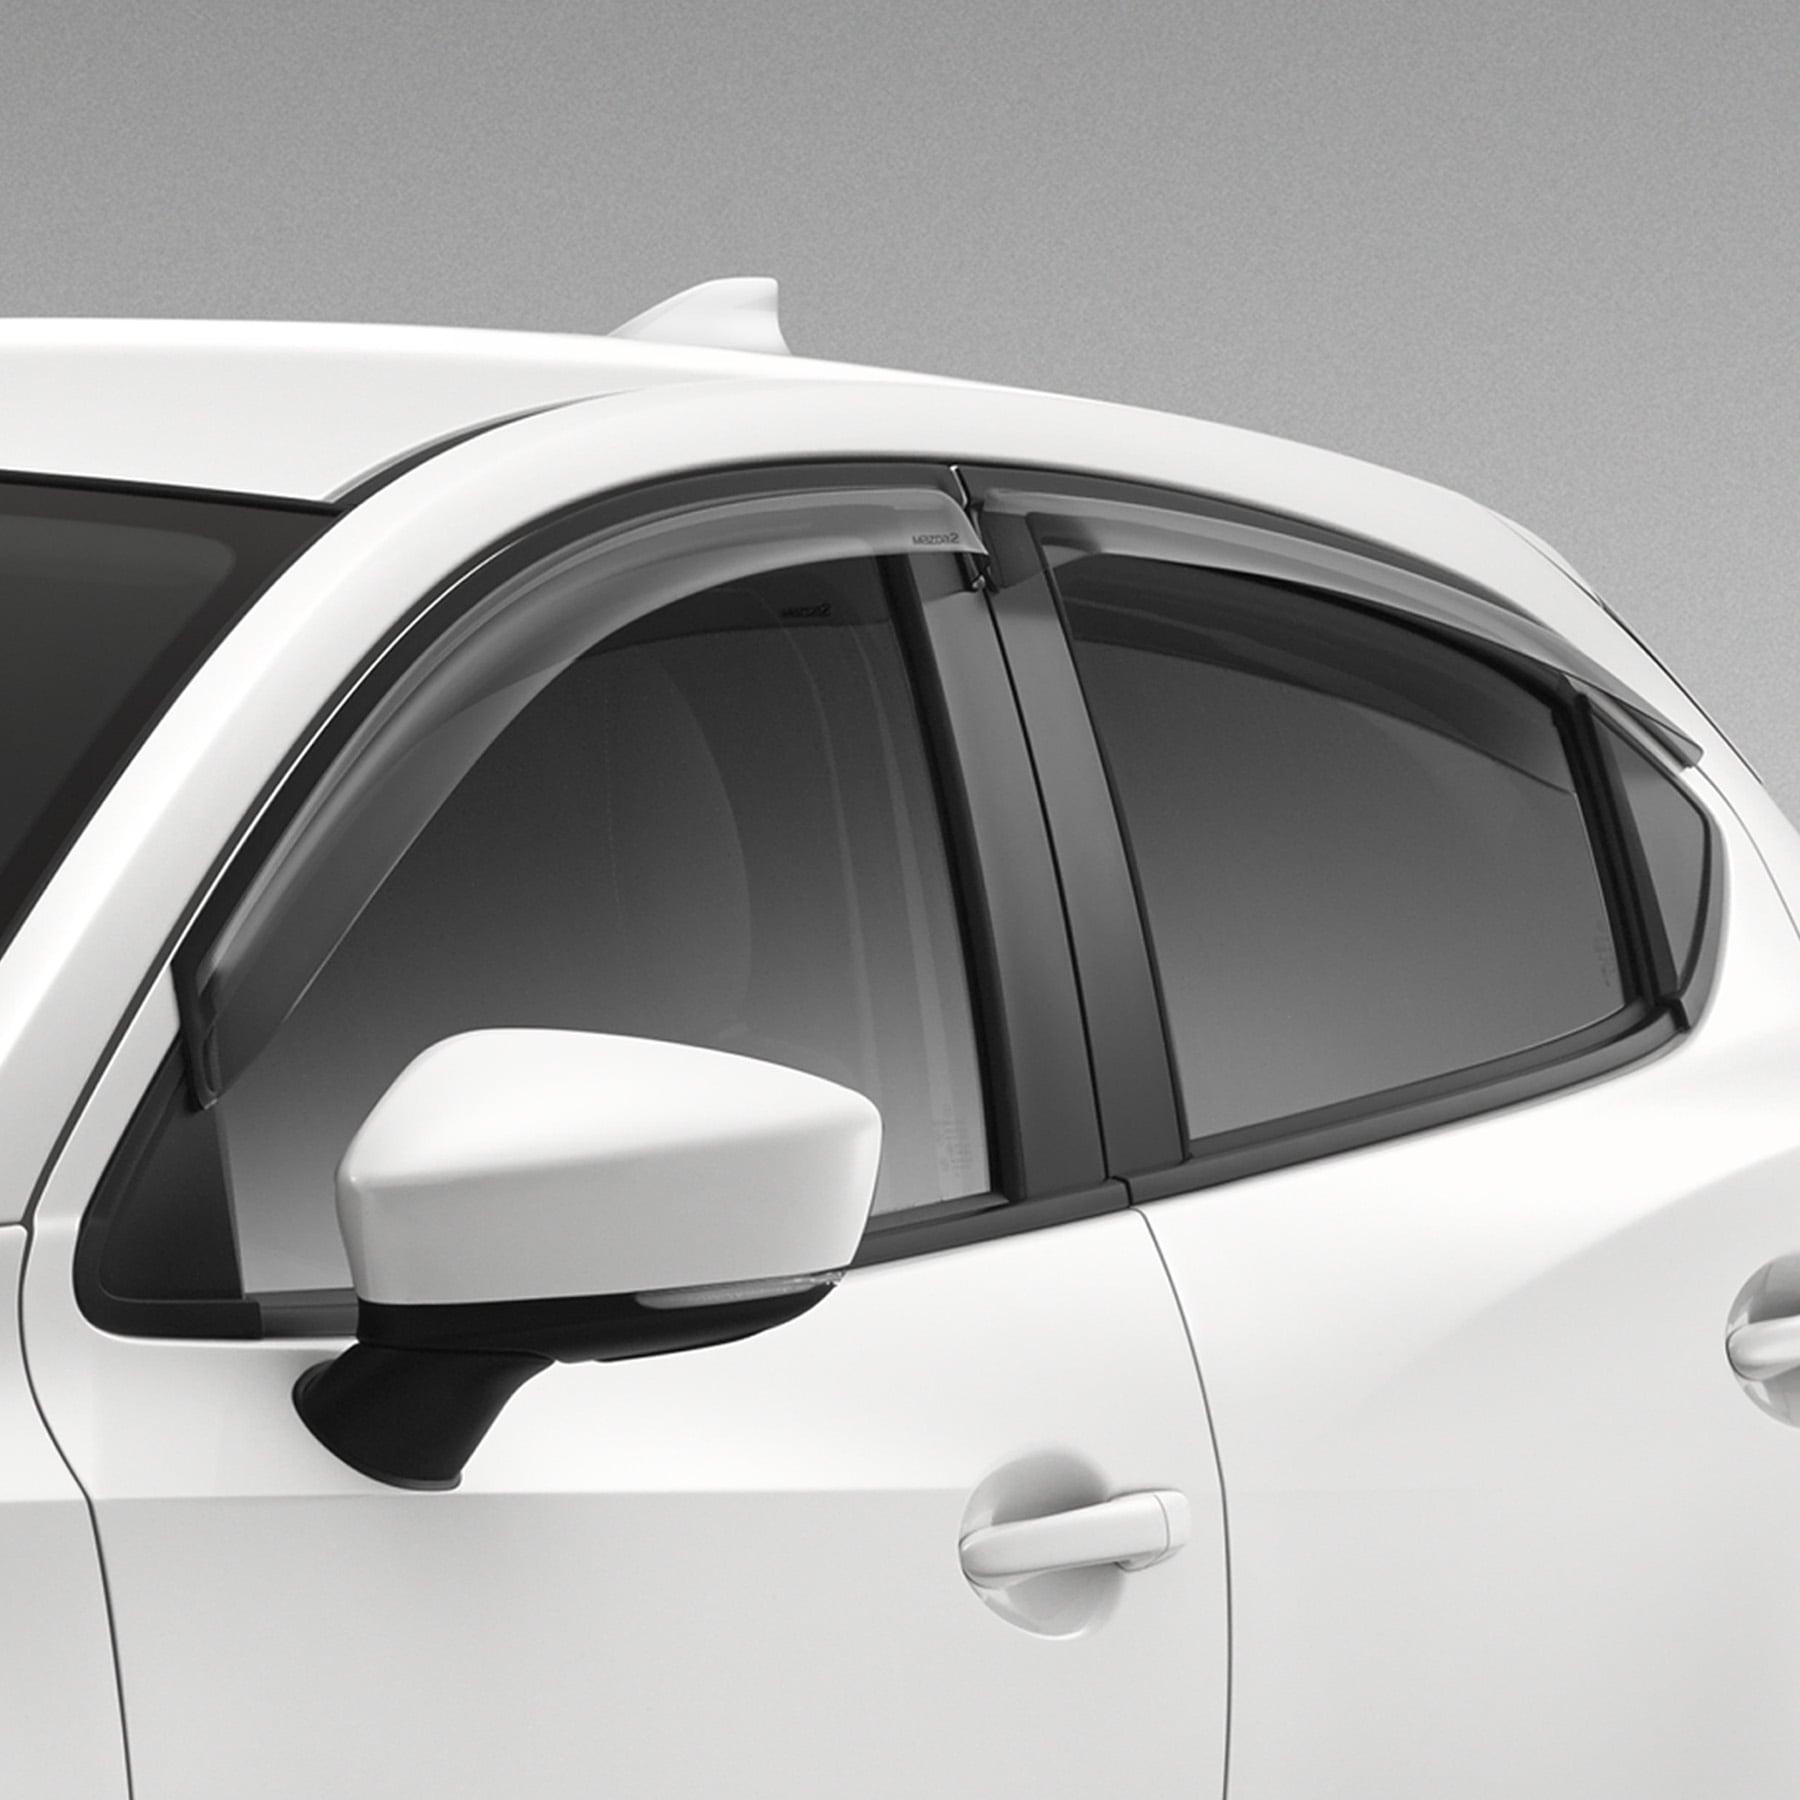 Where Is The Closest Mazda Dealership: Australia's Best Small Hatchback & Sedan